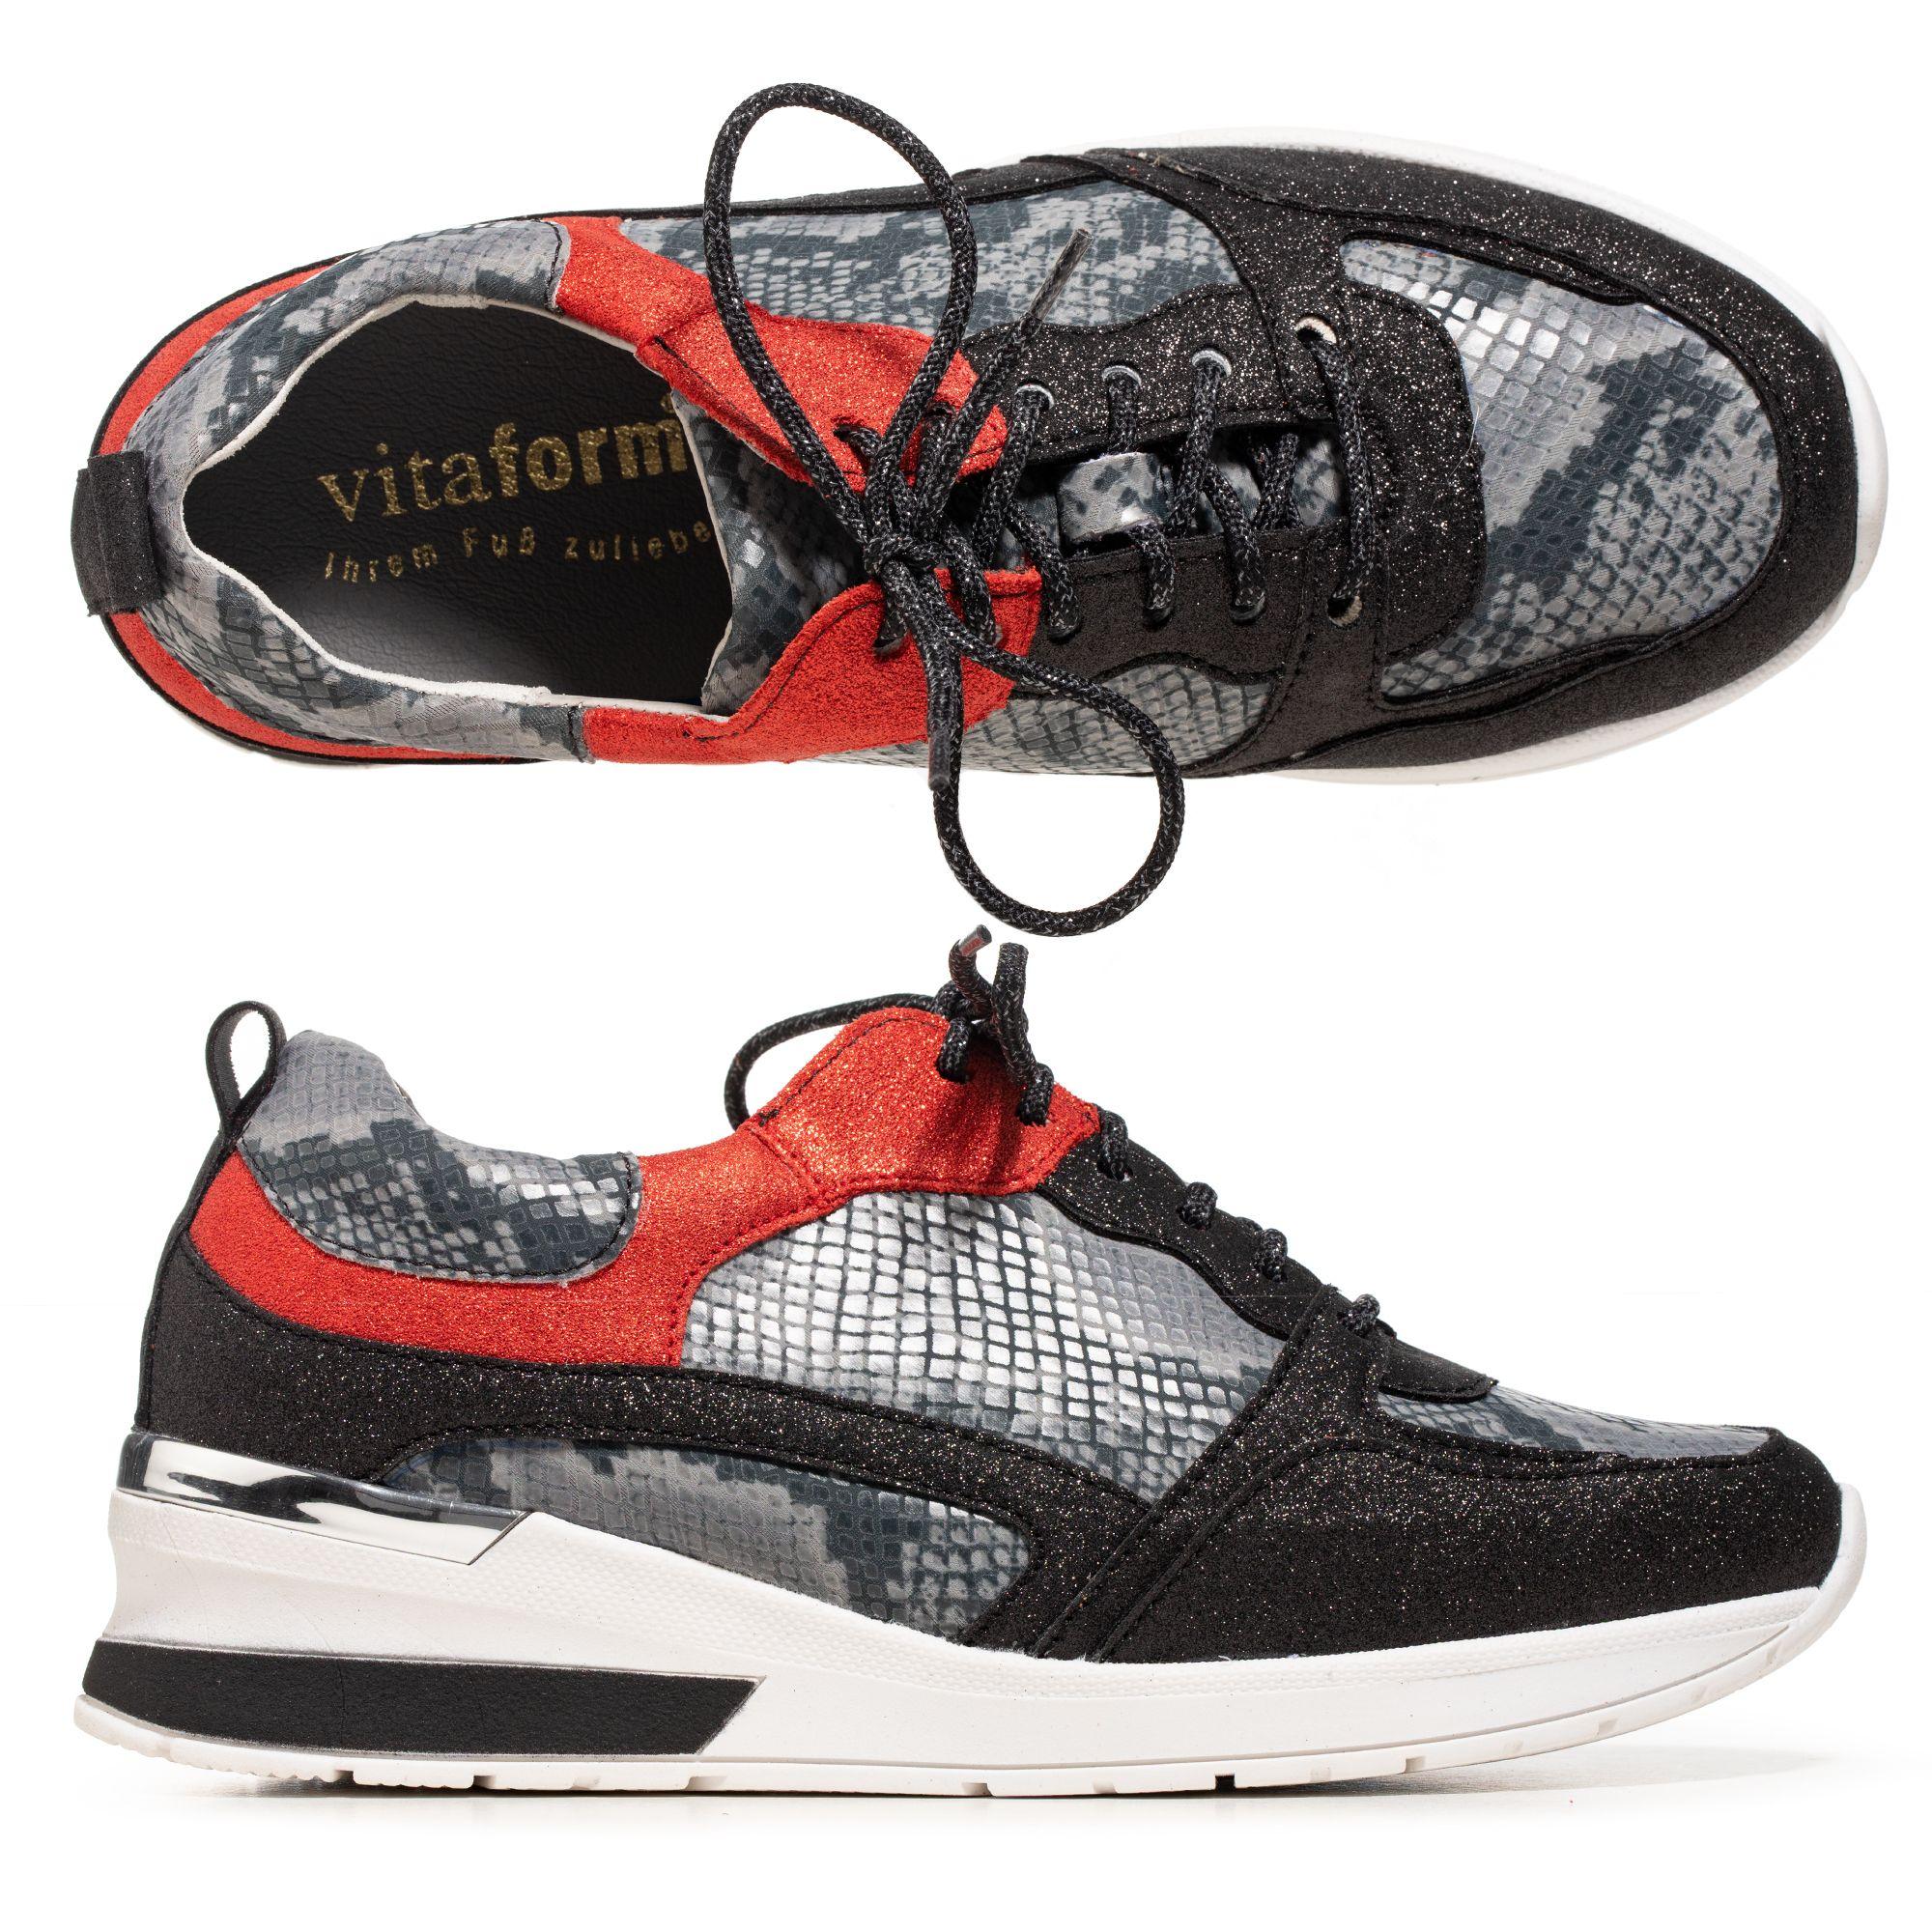 Vitaform Damen Sneaker Materialmix Glitzerdetails Keilsneakersohle Qvc De